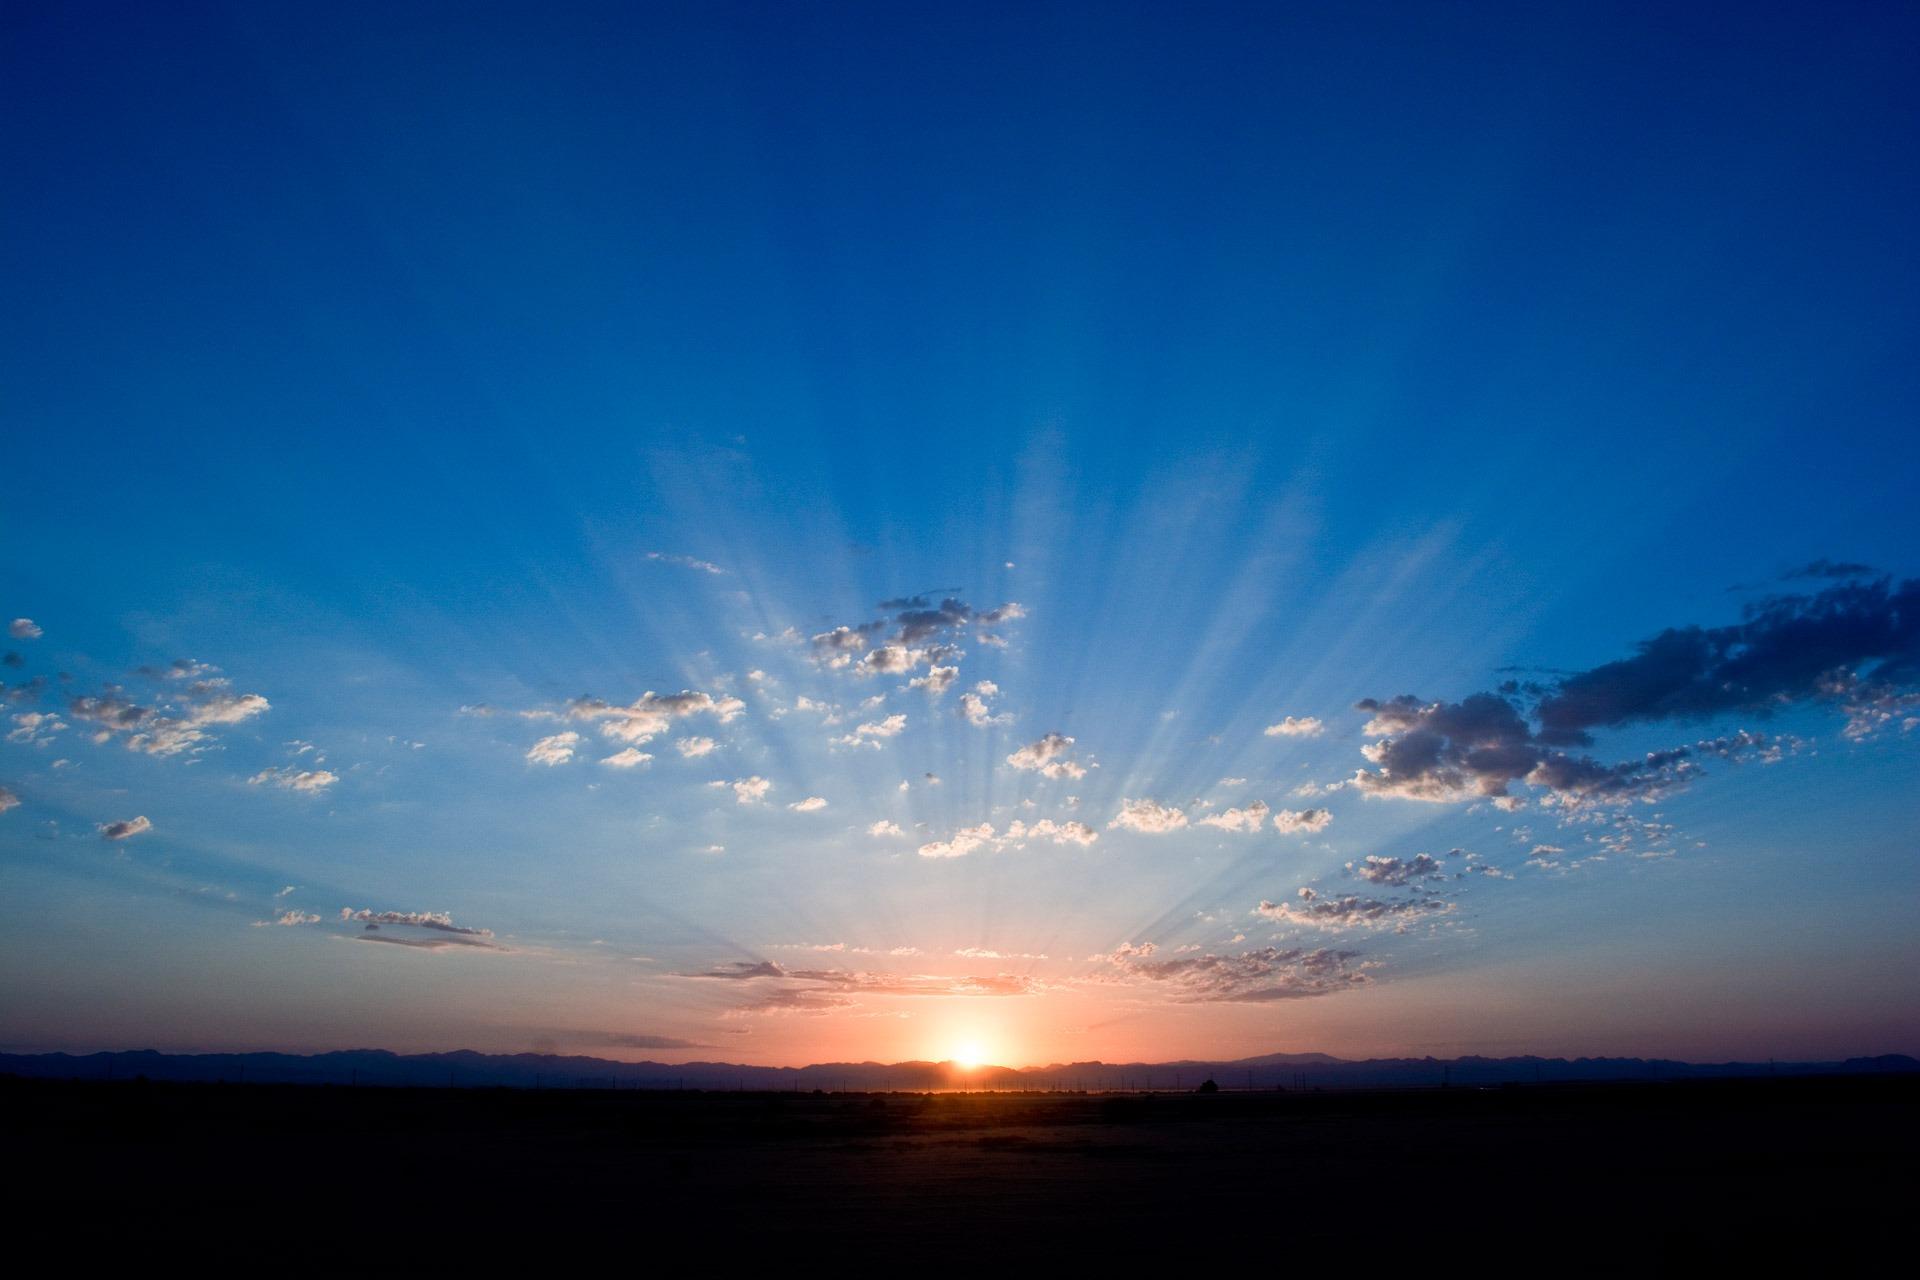 sunrise under cloudy sky